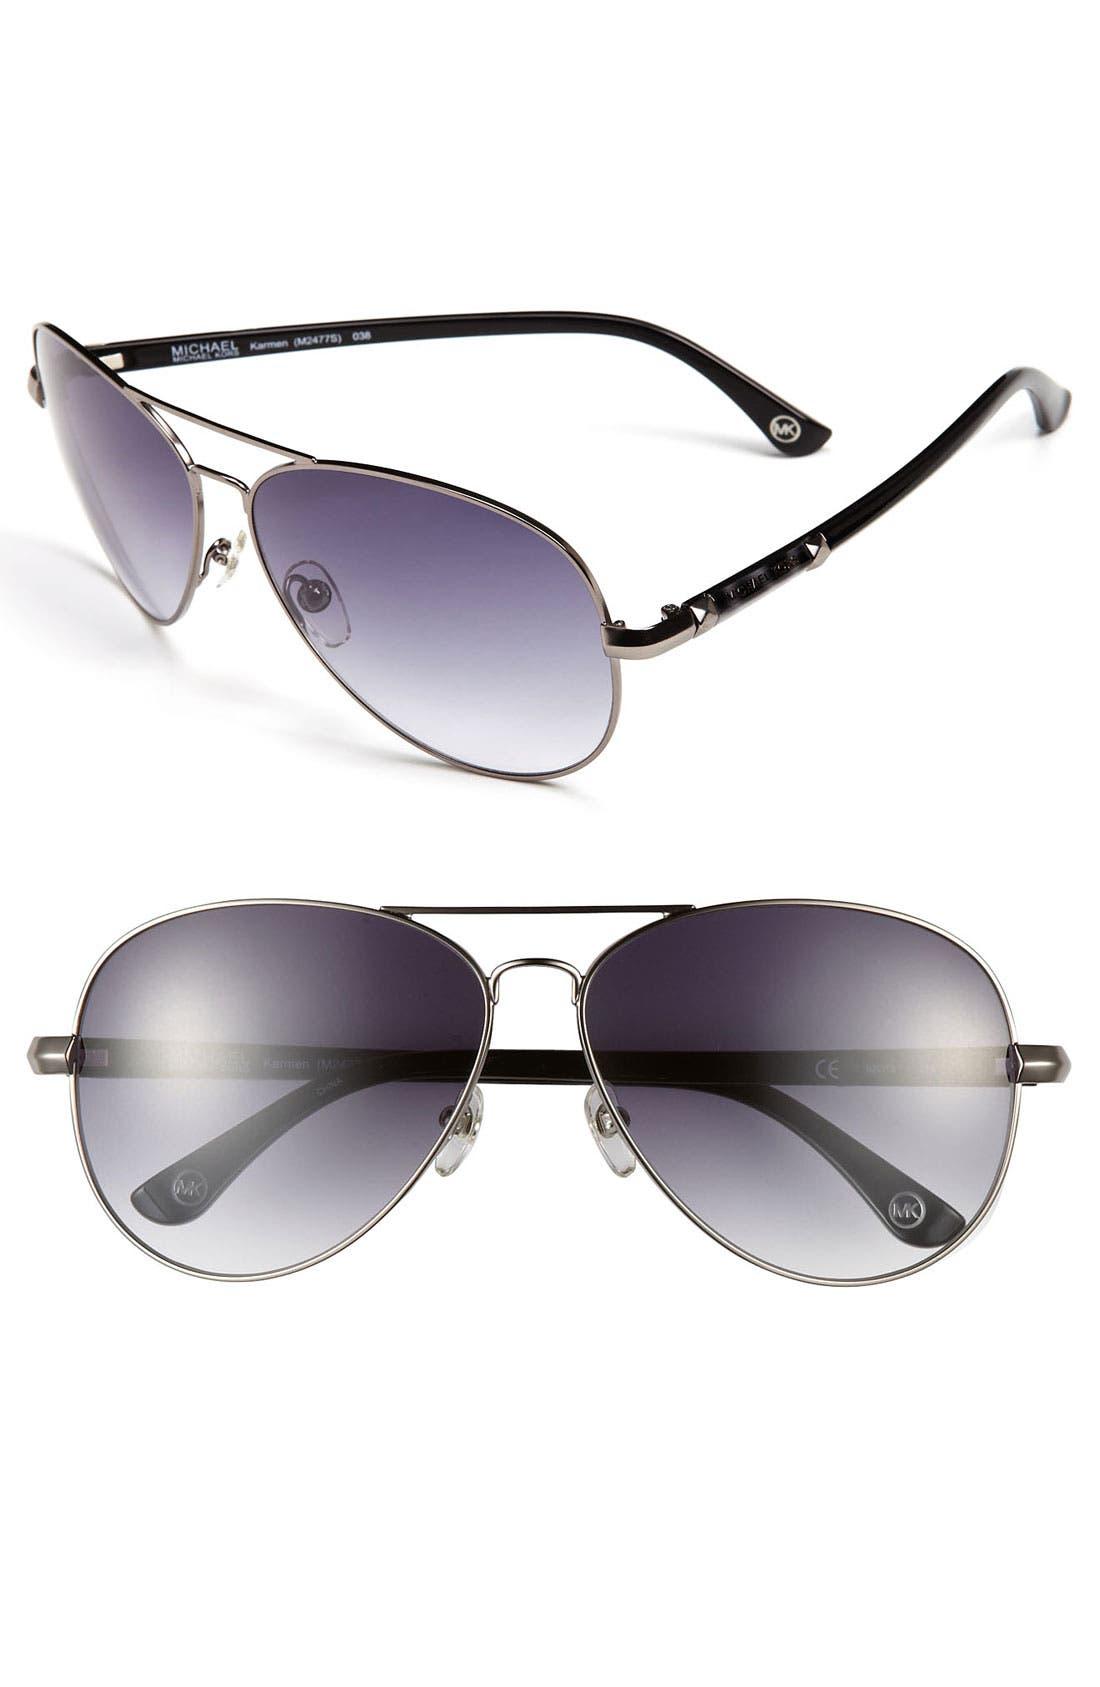 62mm Metal Aviator Sunglasses,                             Main thumbnail 1, color,